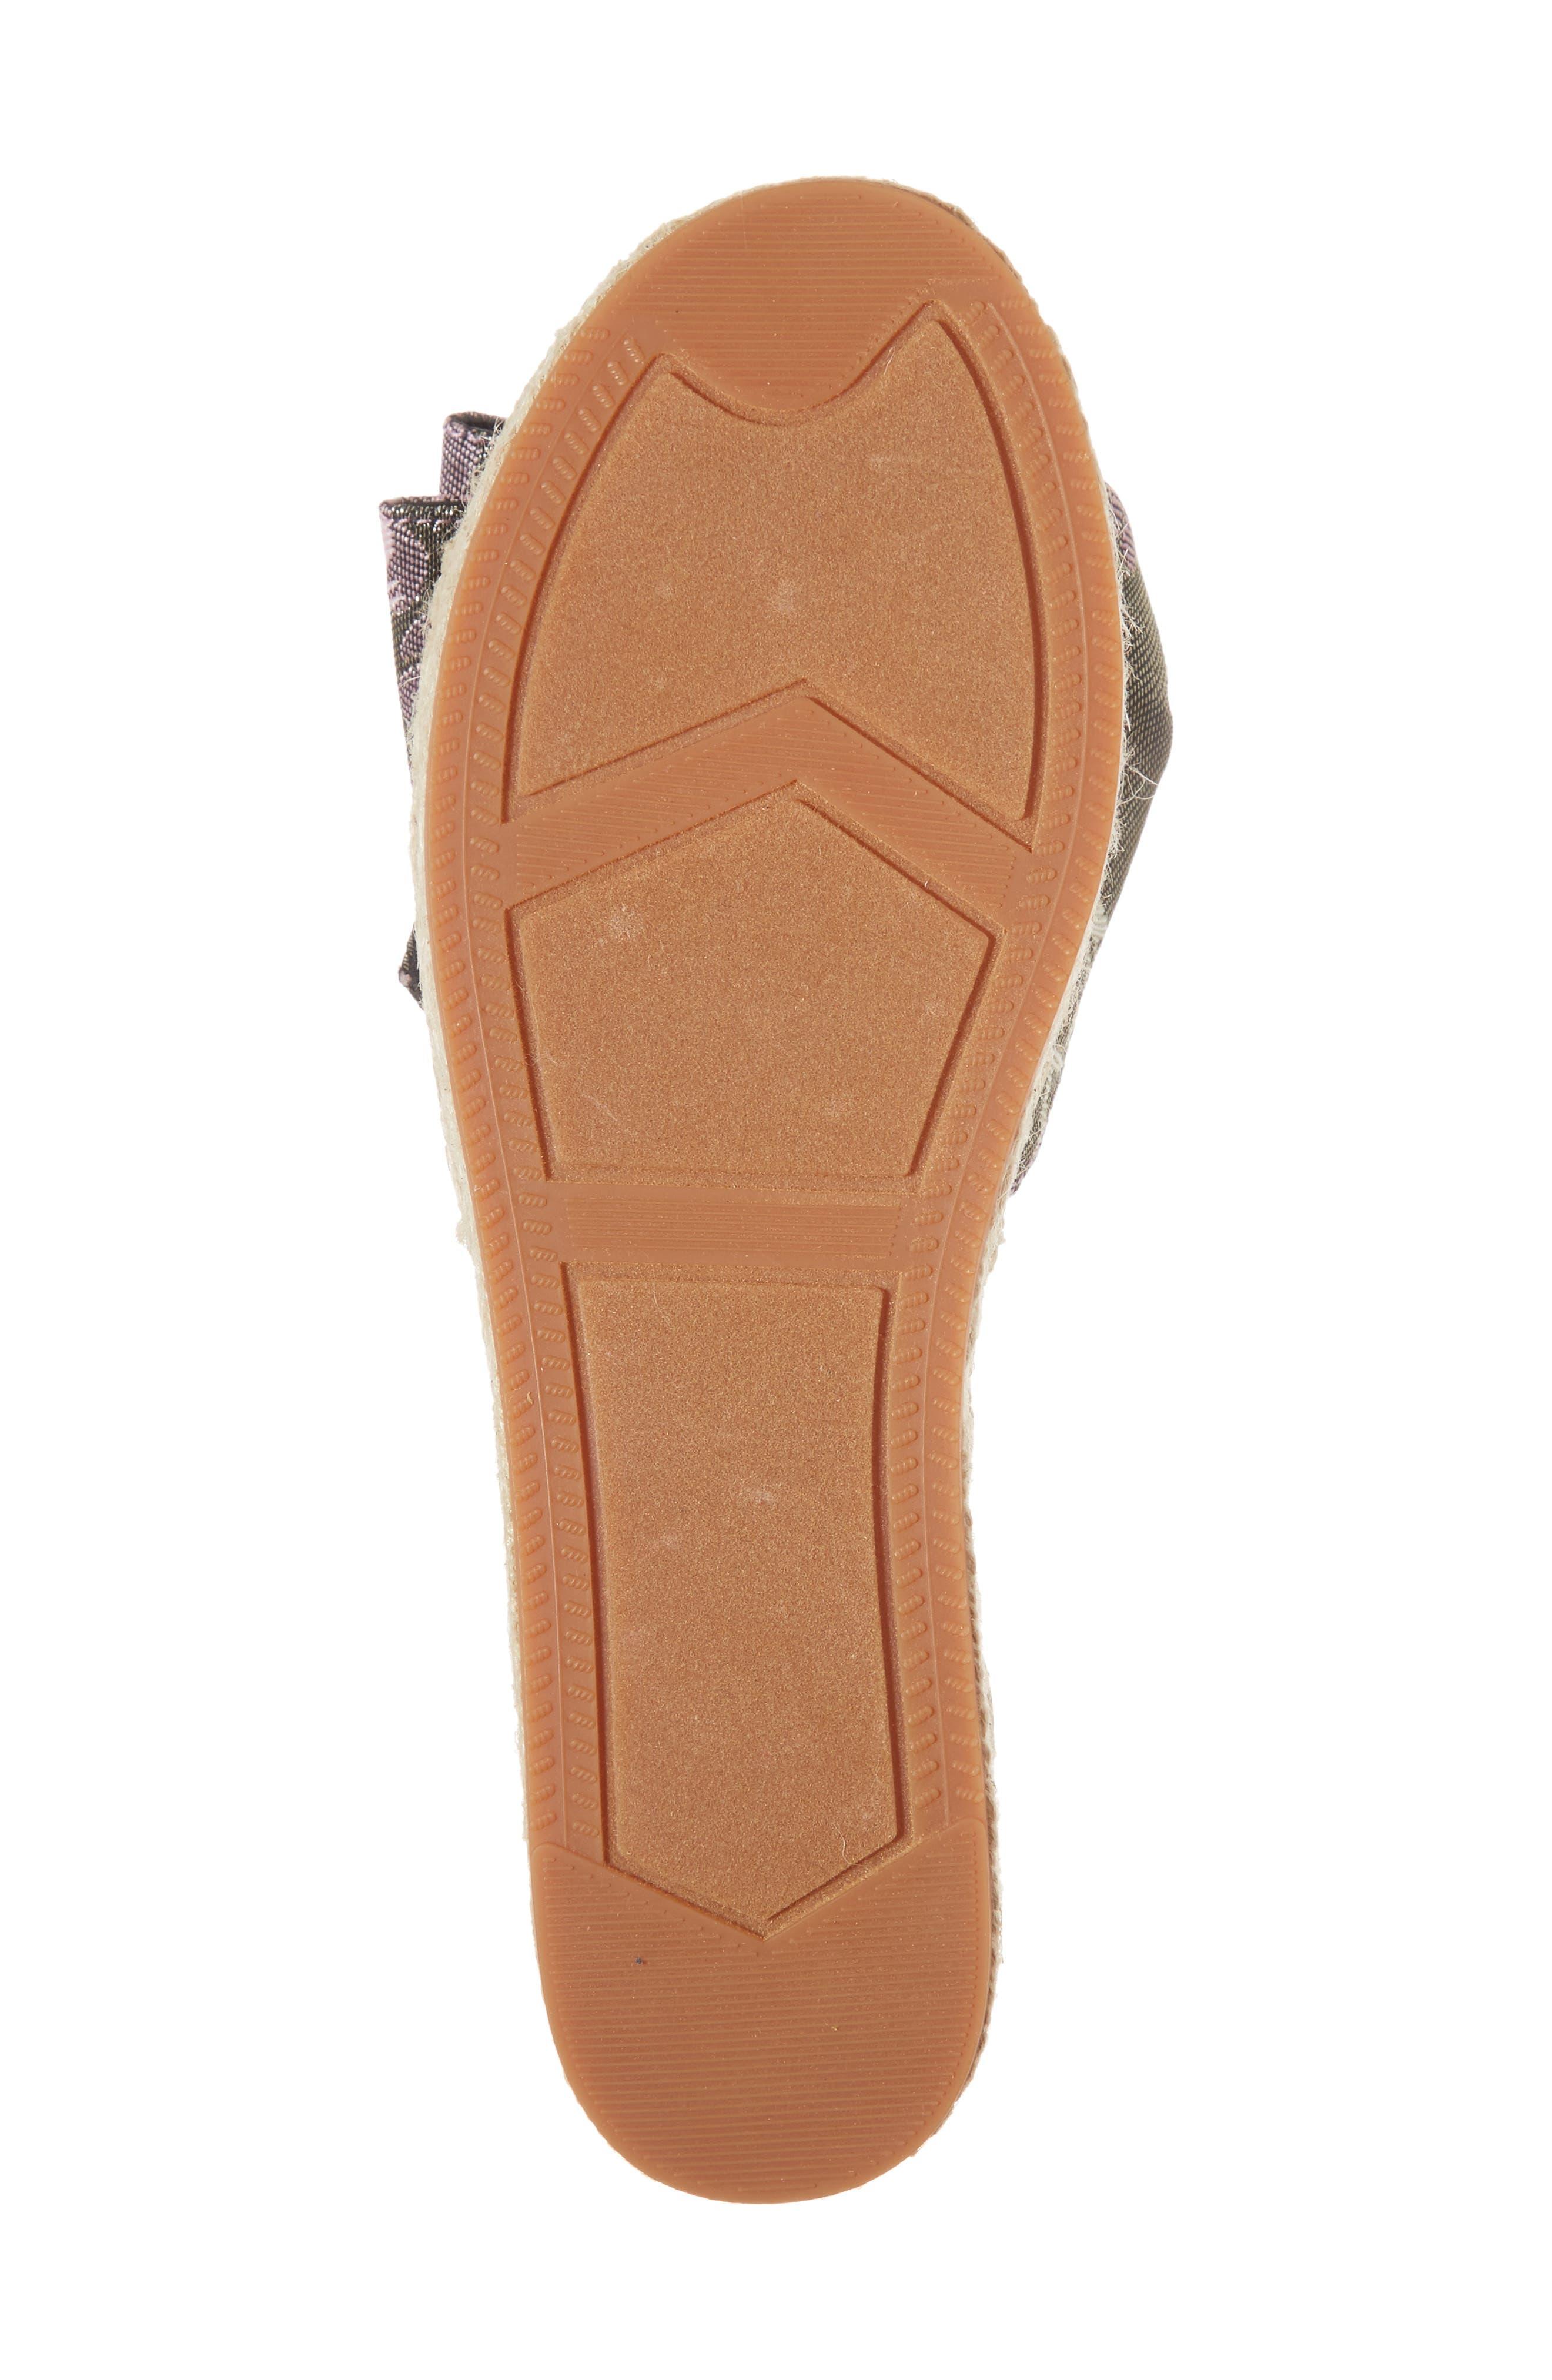 Giana Bow Slide Sandal,                             Alternate thumbnail 6, color,                             GREEN MULTI JACQUARD